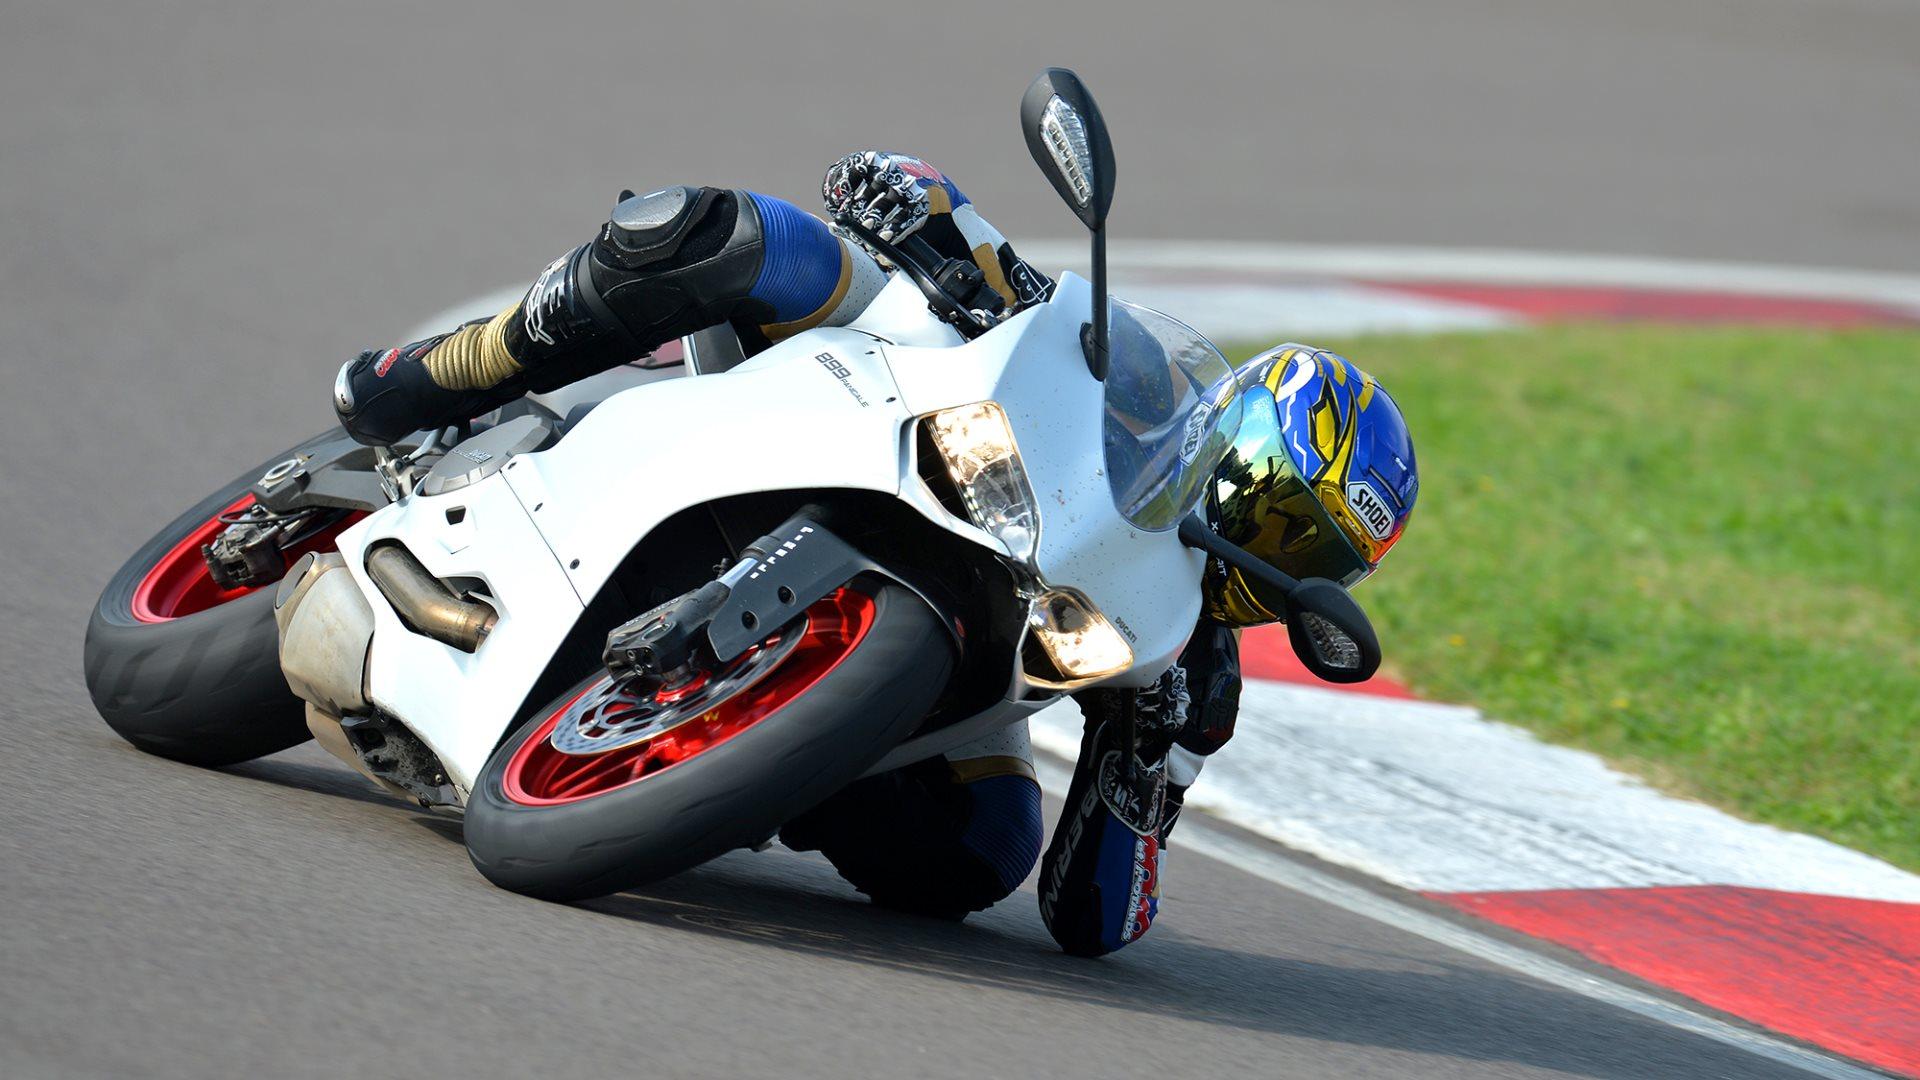 racing bike hd wallpaper | background image | 1920x1080 | id:466171